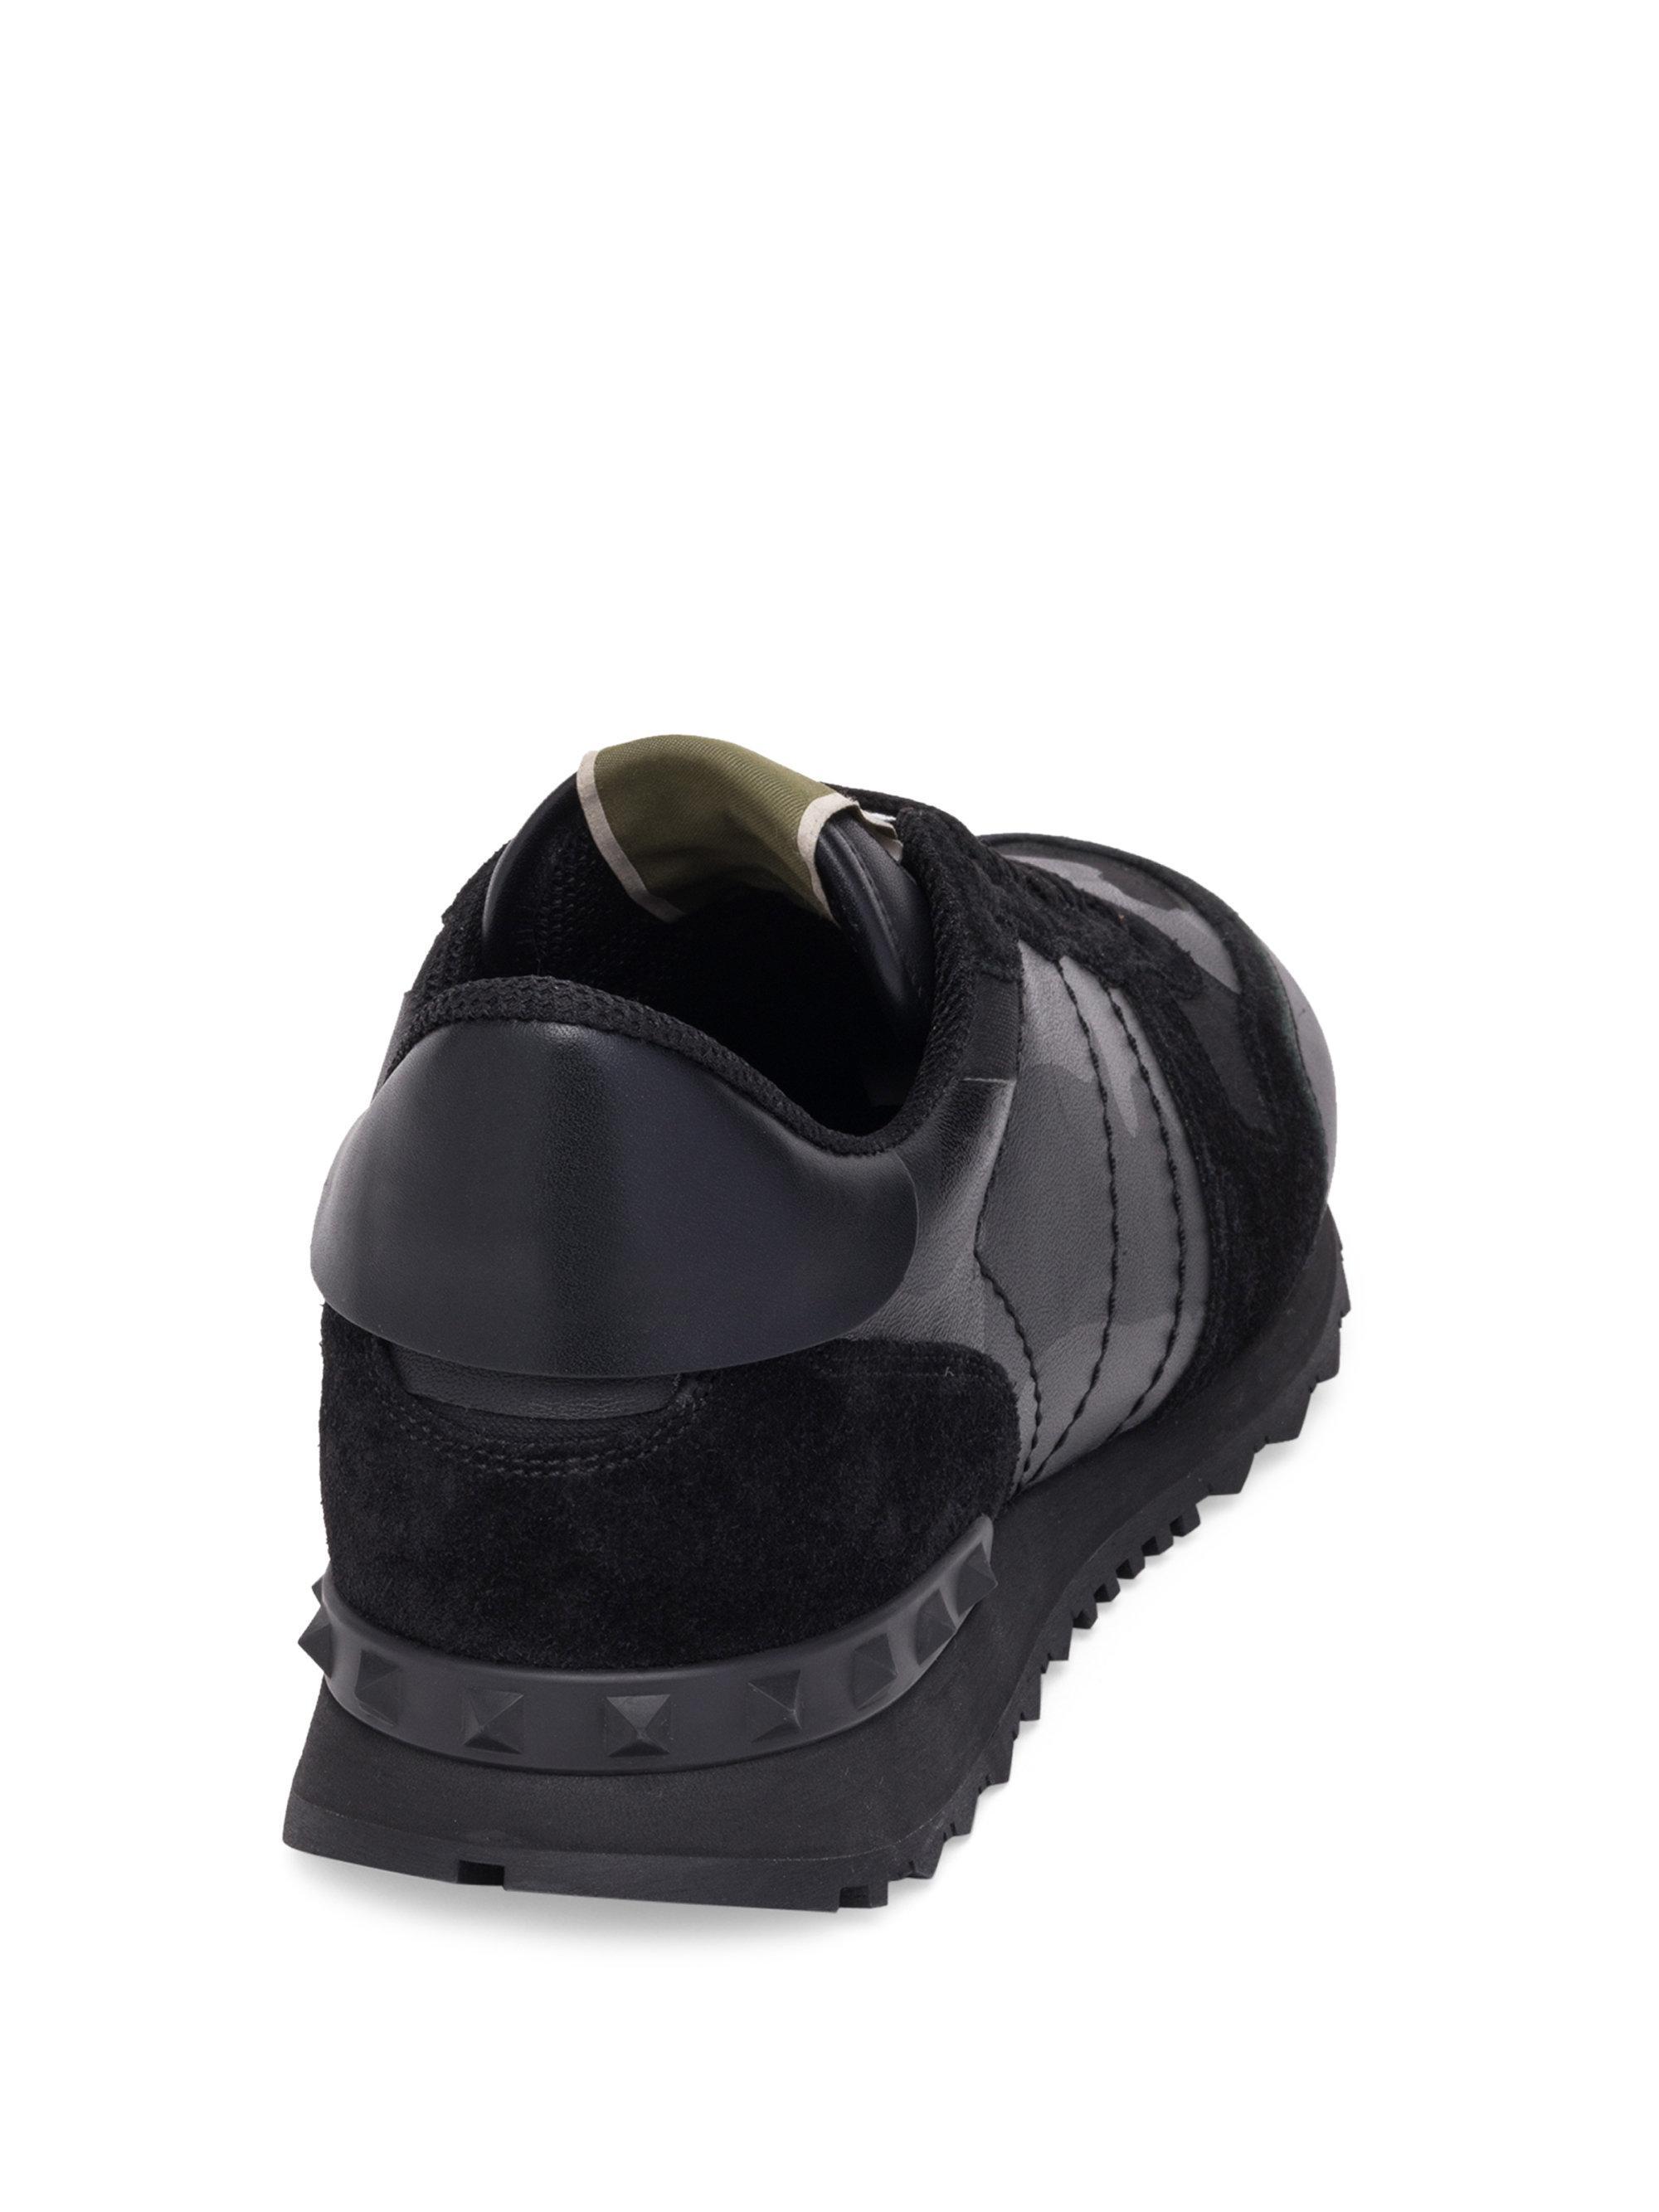 Valentino Noir Camo Rockstud Sneakers 6ZGUWungy